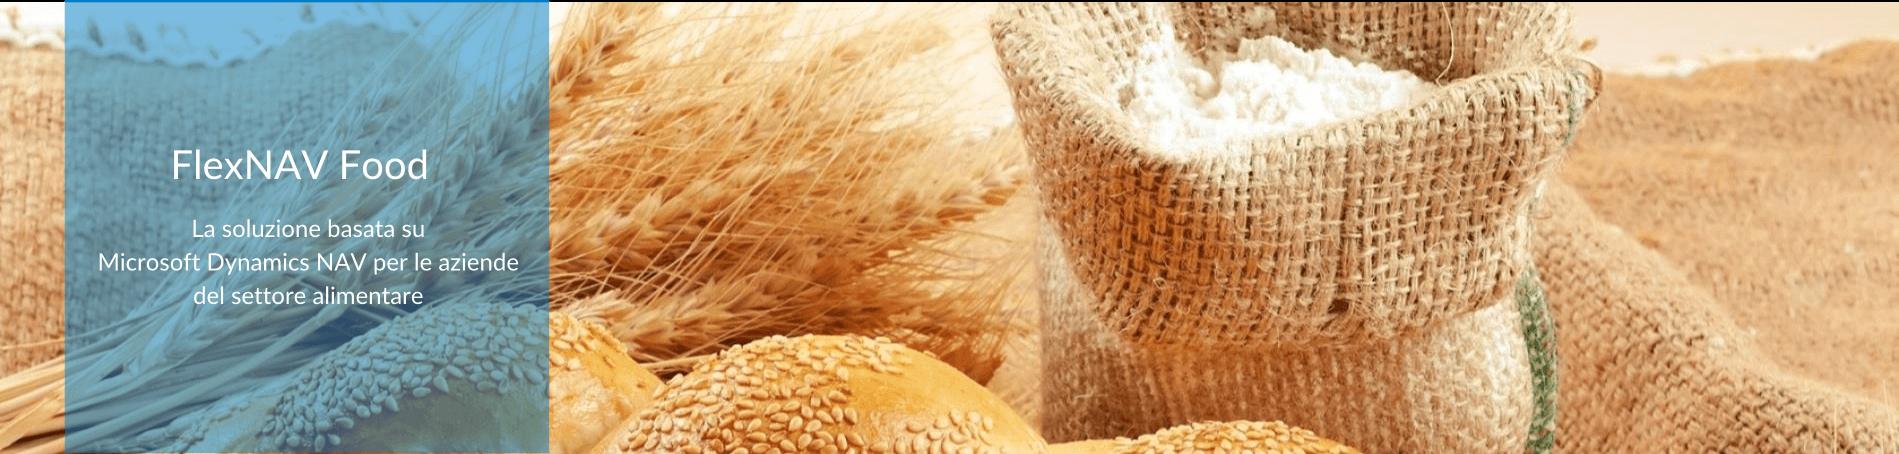 flexnav microsoft dynamics nav settore alimentare